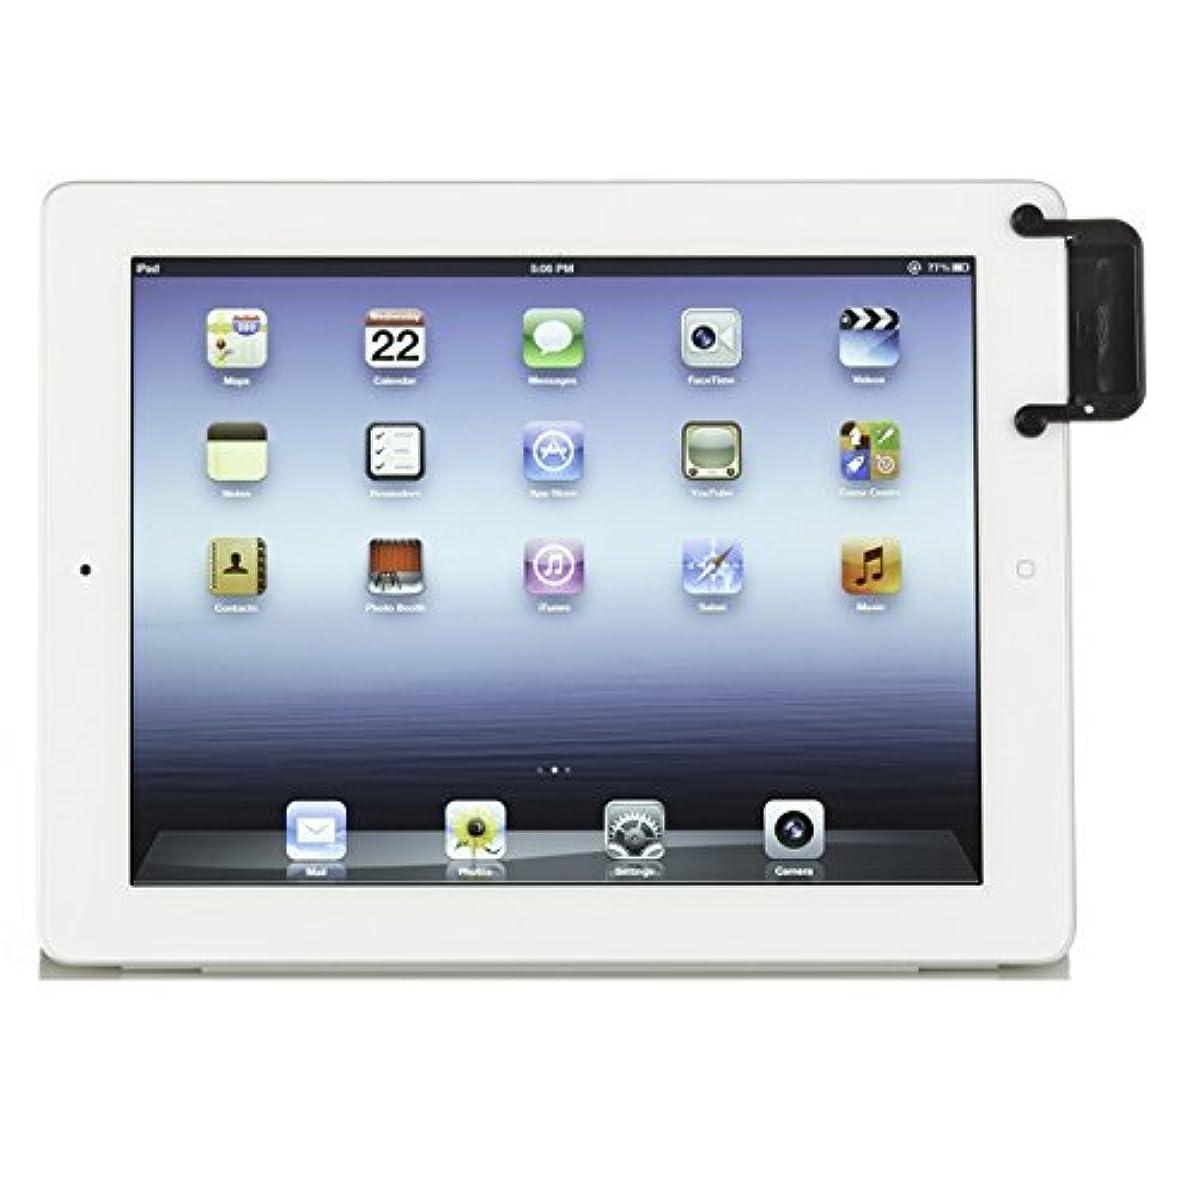 SOUNDBENDER 2.0 Easy-Fit Magnetic Sound Enhancer for iPad 2 & iPad 3 & iPad 4 - BLACK